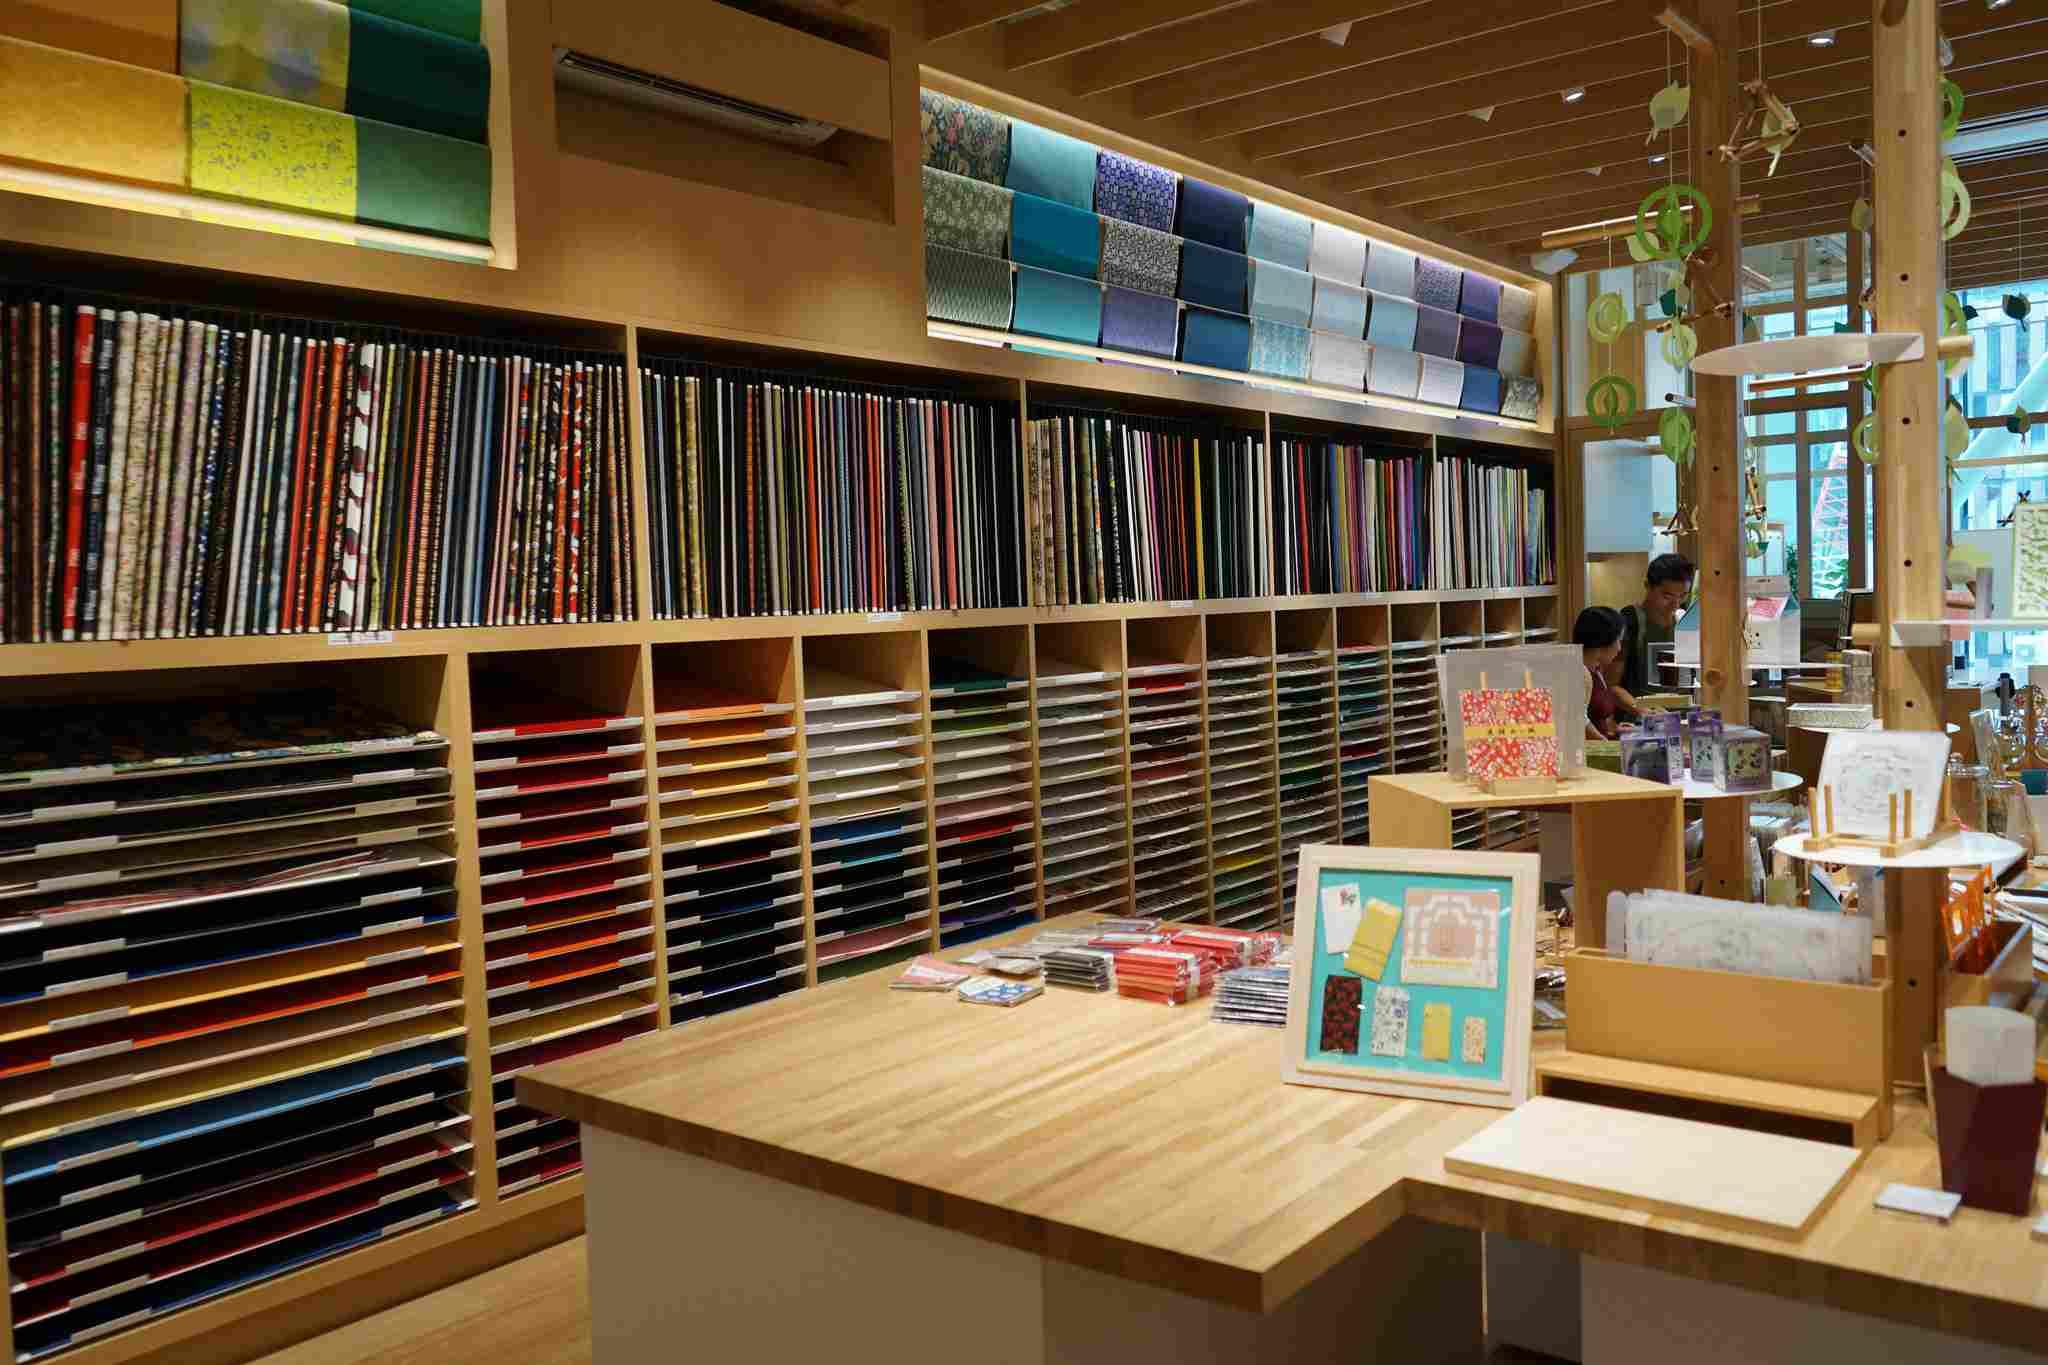 Interior of Itoya Stationery store ginza, tokyo